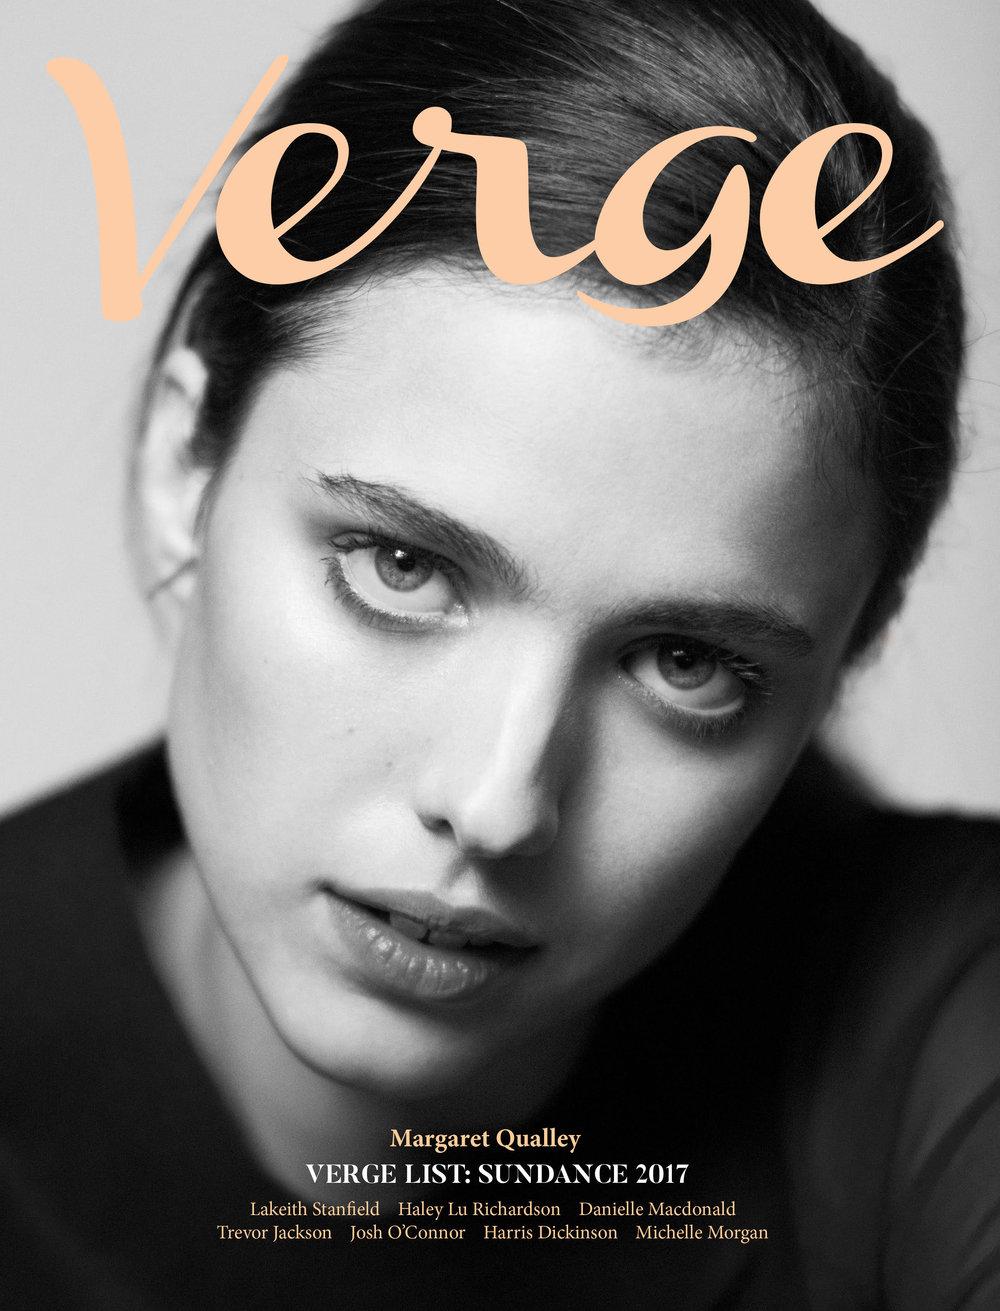 Verge/ Margaret Qualley/ Jeff Vespa